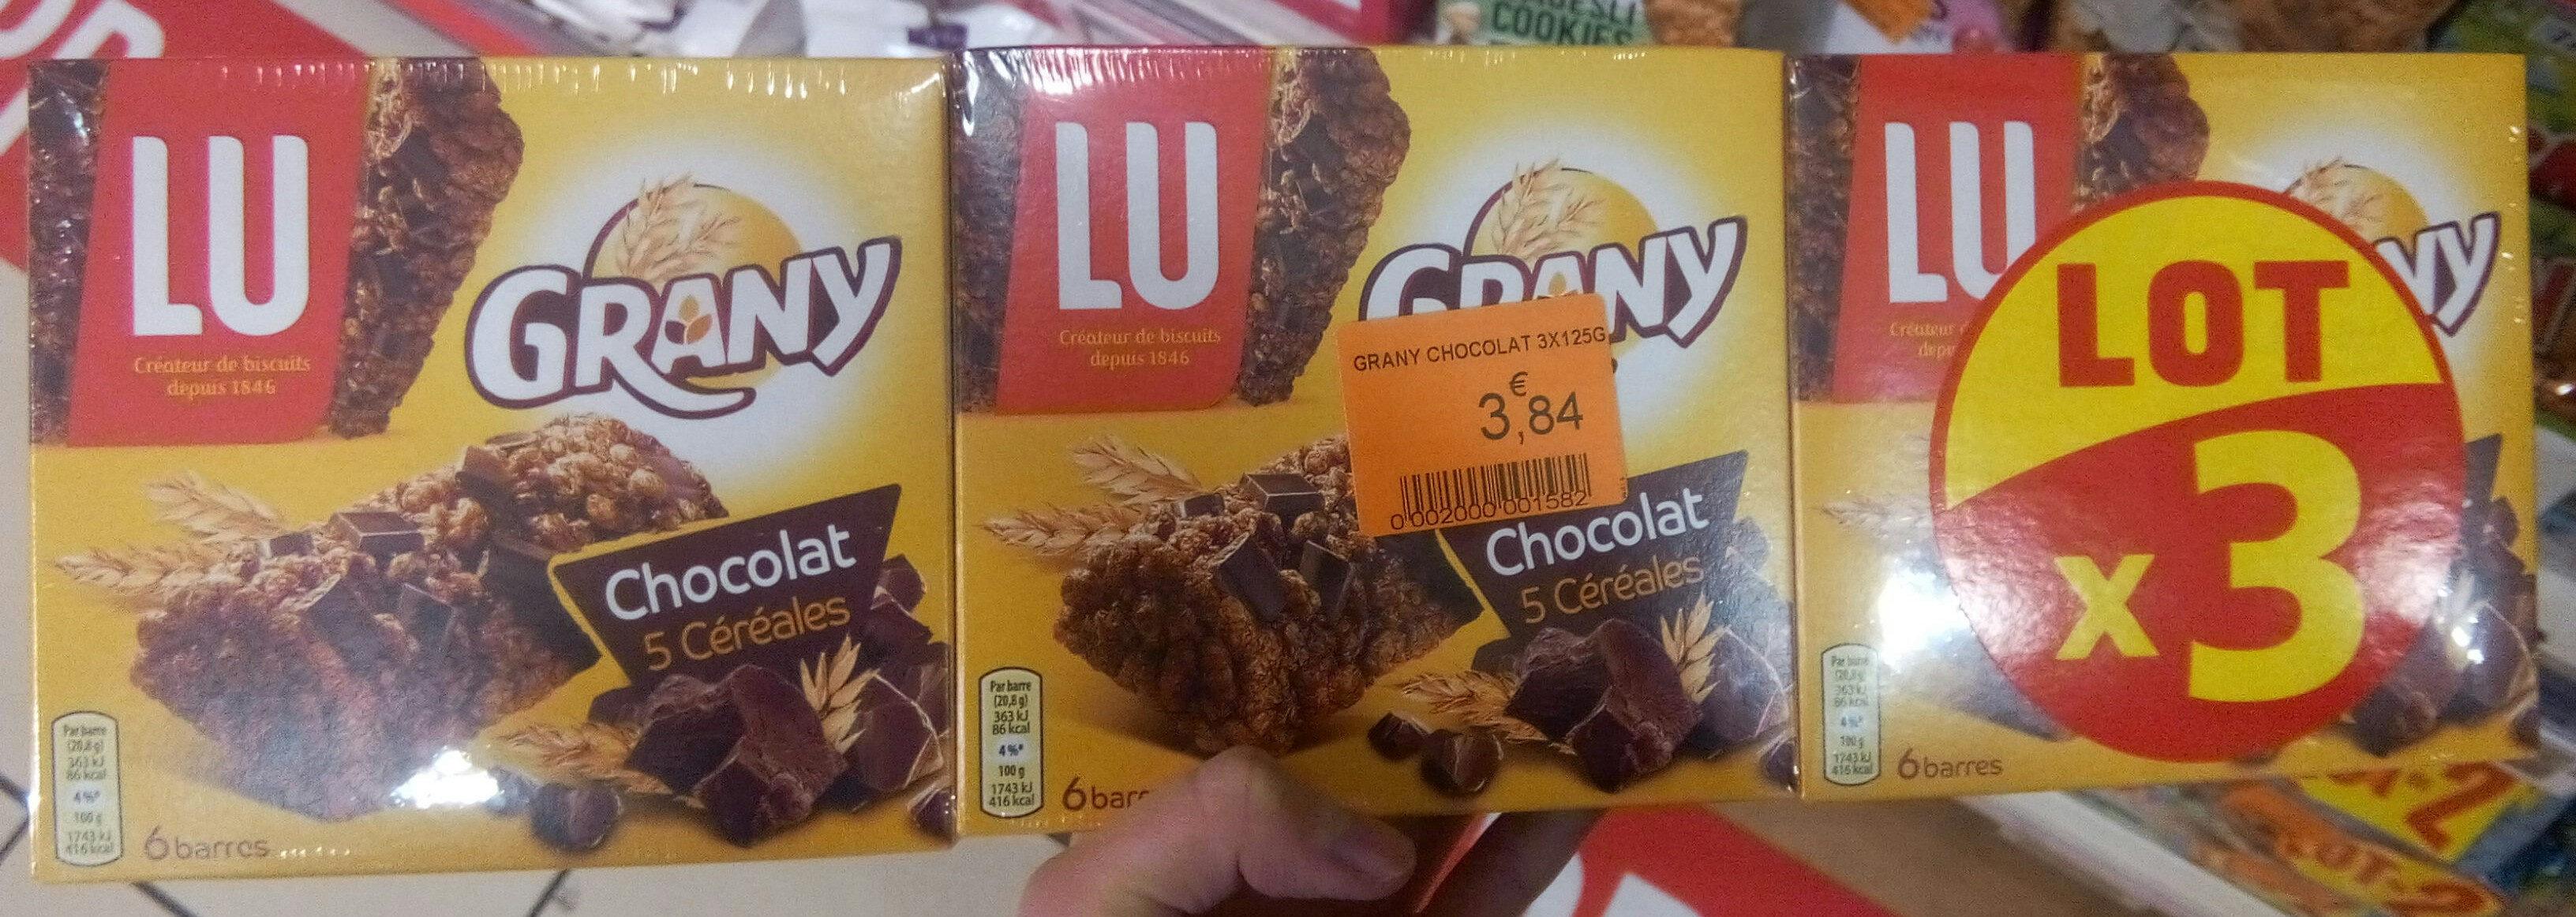 Grany 3x125gr chocolat lot - Produit - fr